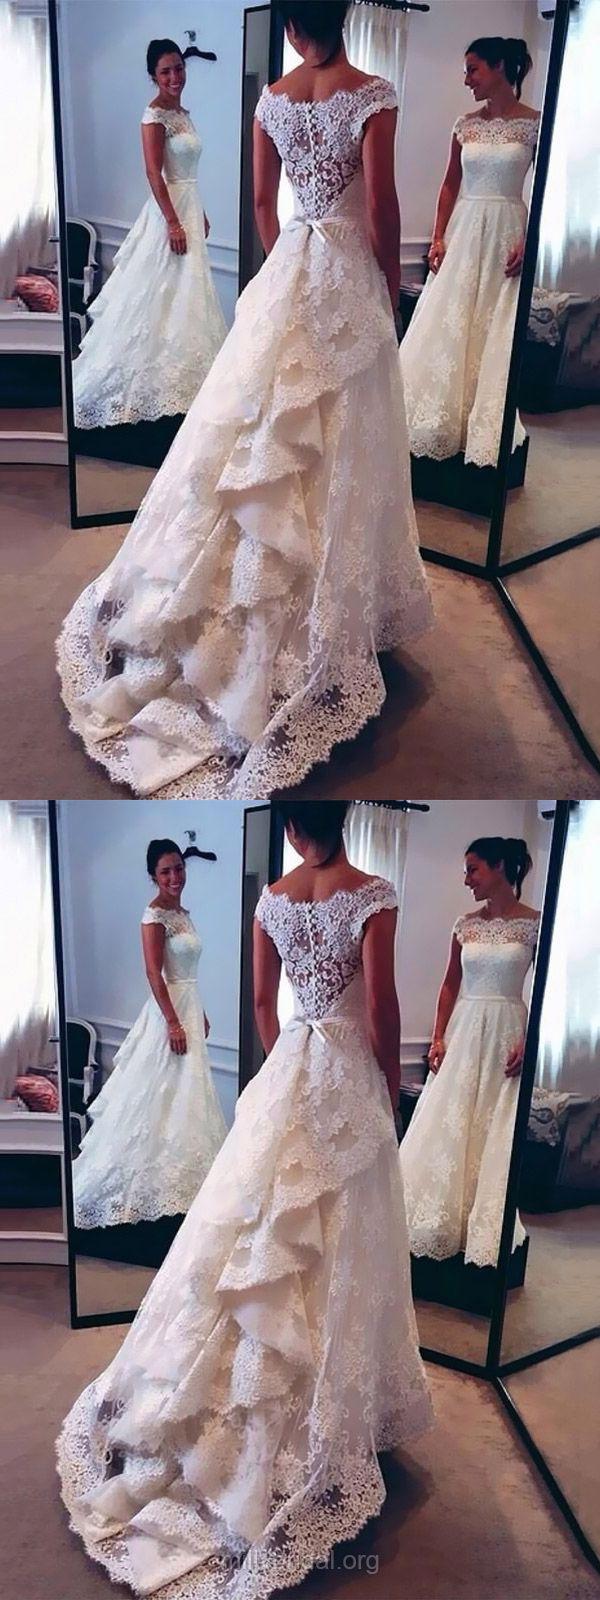 Cheap Wedding Dresses A-line, Lace Bridal Dresses 2018, Modest Wedding Dresses Scalloped Neck Watteau Train,  Sexy Wedding Dresses For Women Simple Online